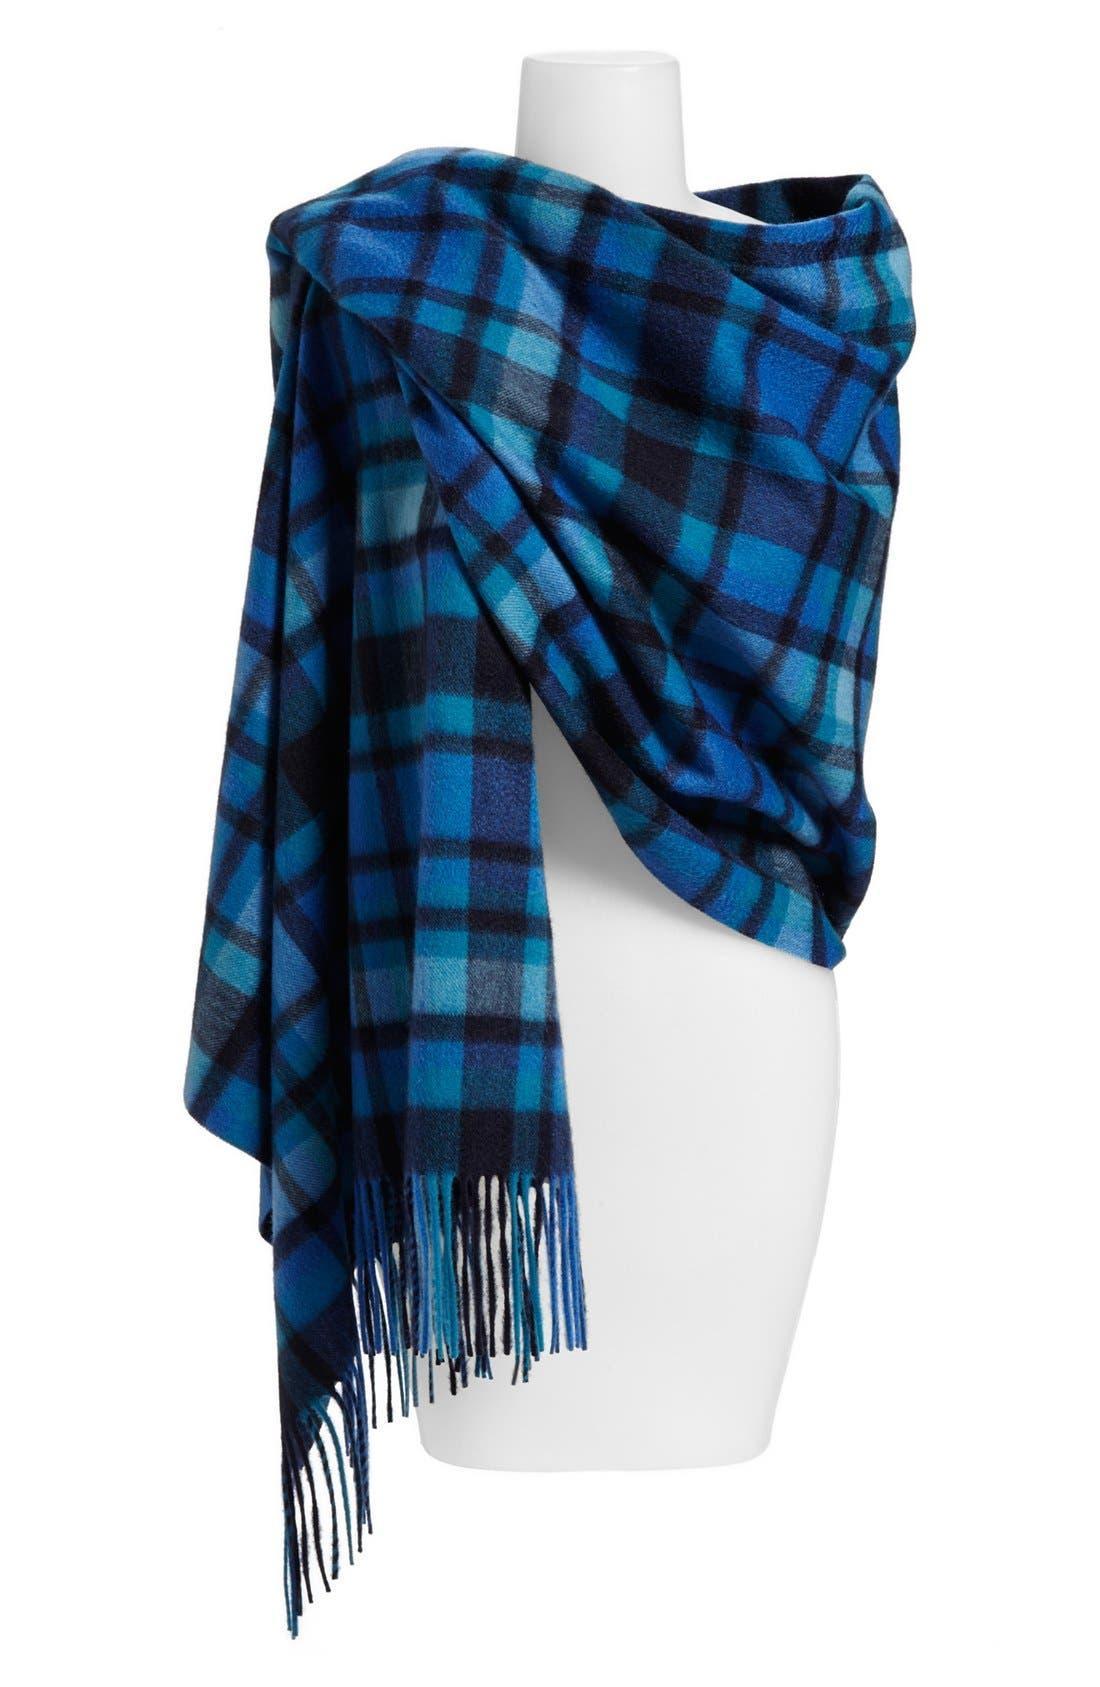 Main Image - Nordstrom Plaid Woven Cashmere Wrap